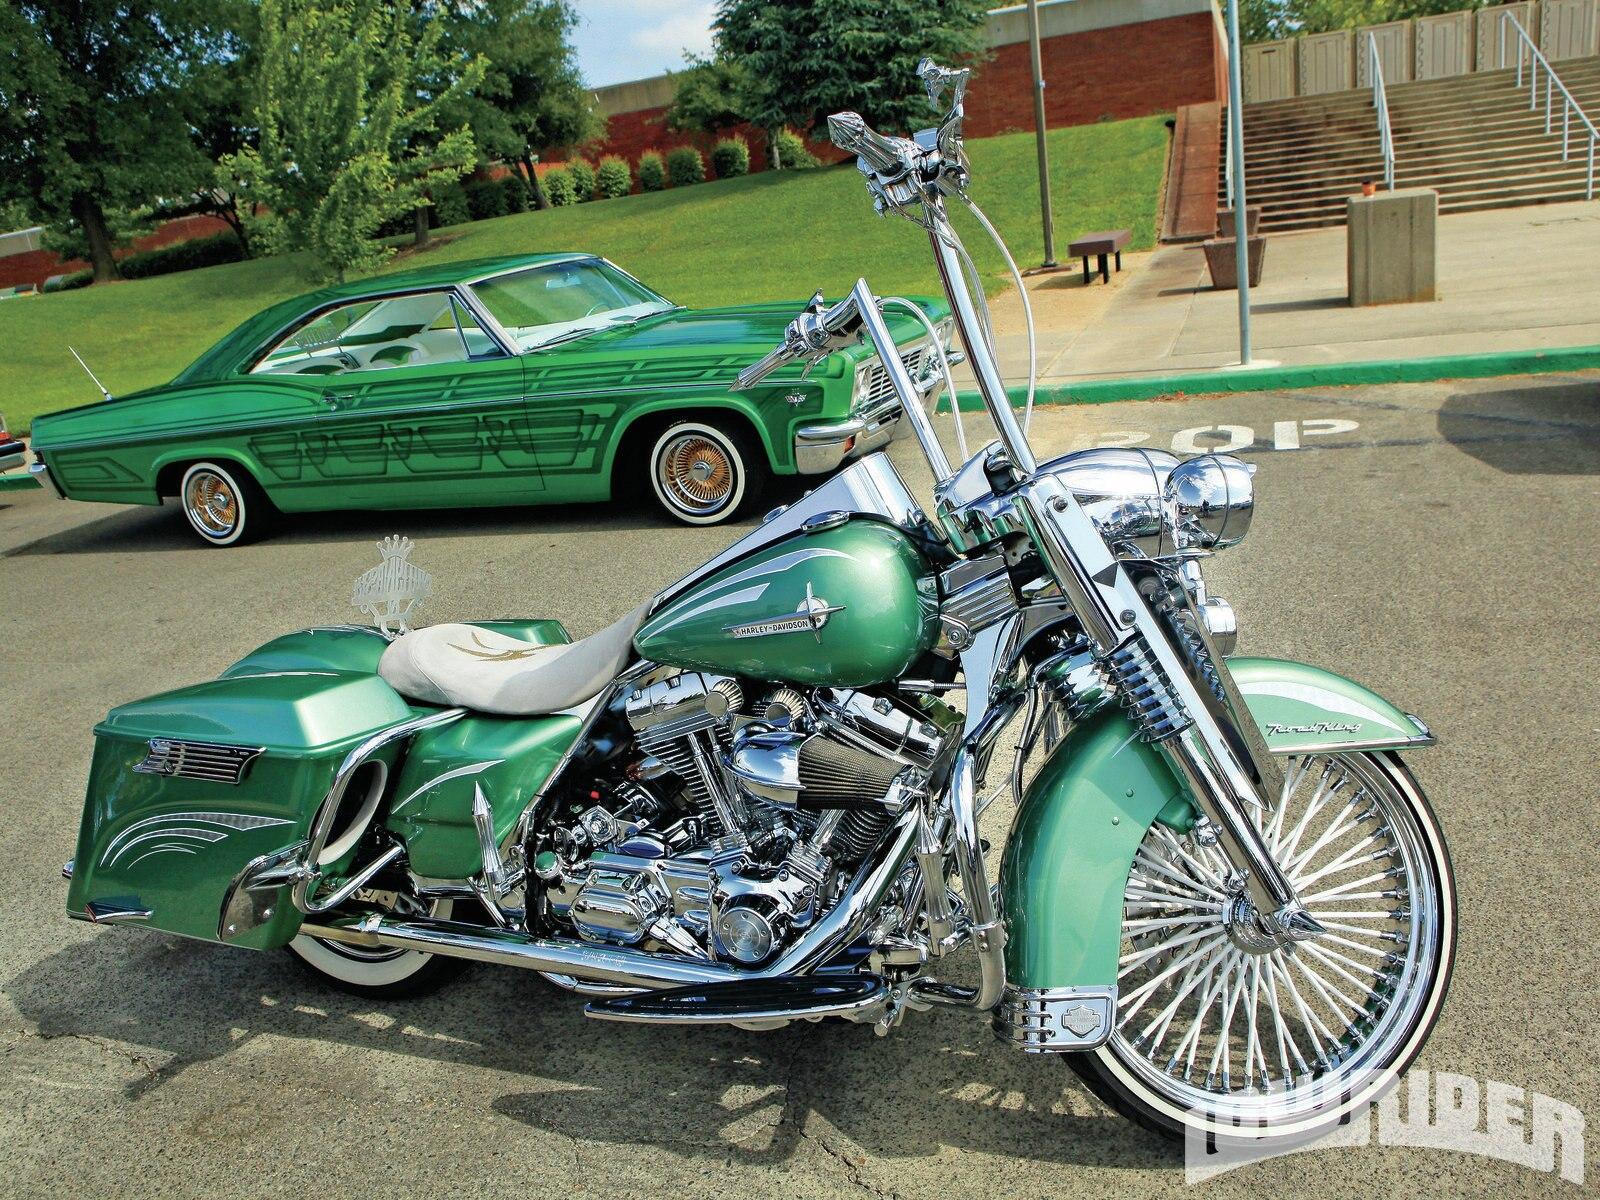 Harley Riders: Socios Car Club 10th Annual Car Show